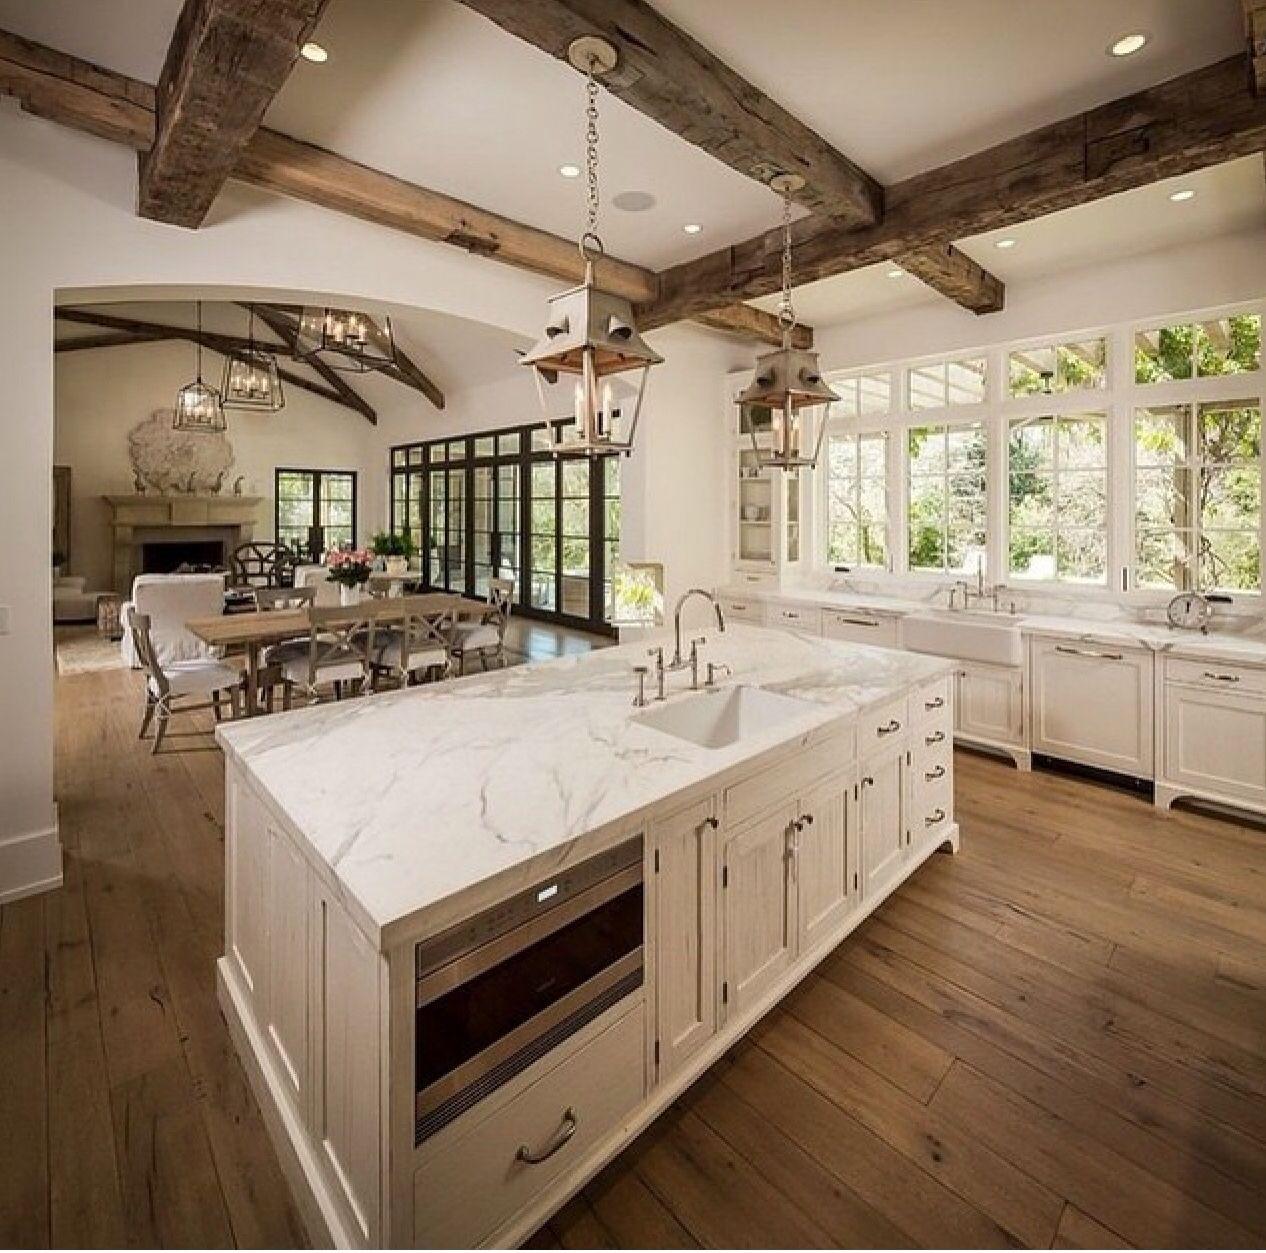 kutchina modular kitchen kitchen layout ideas country kitchen rh pinterest com